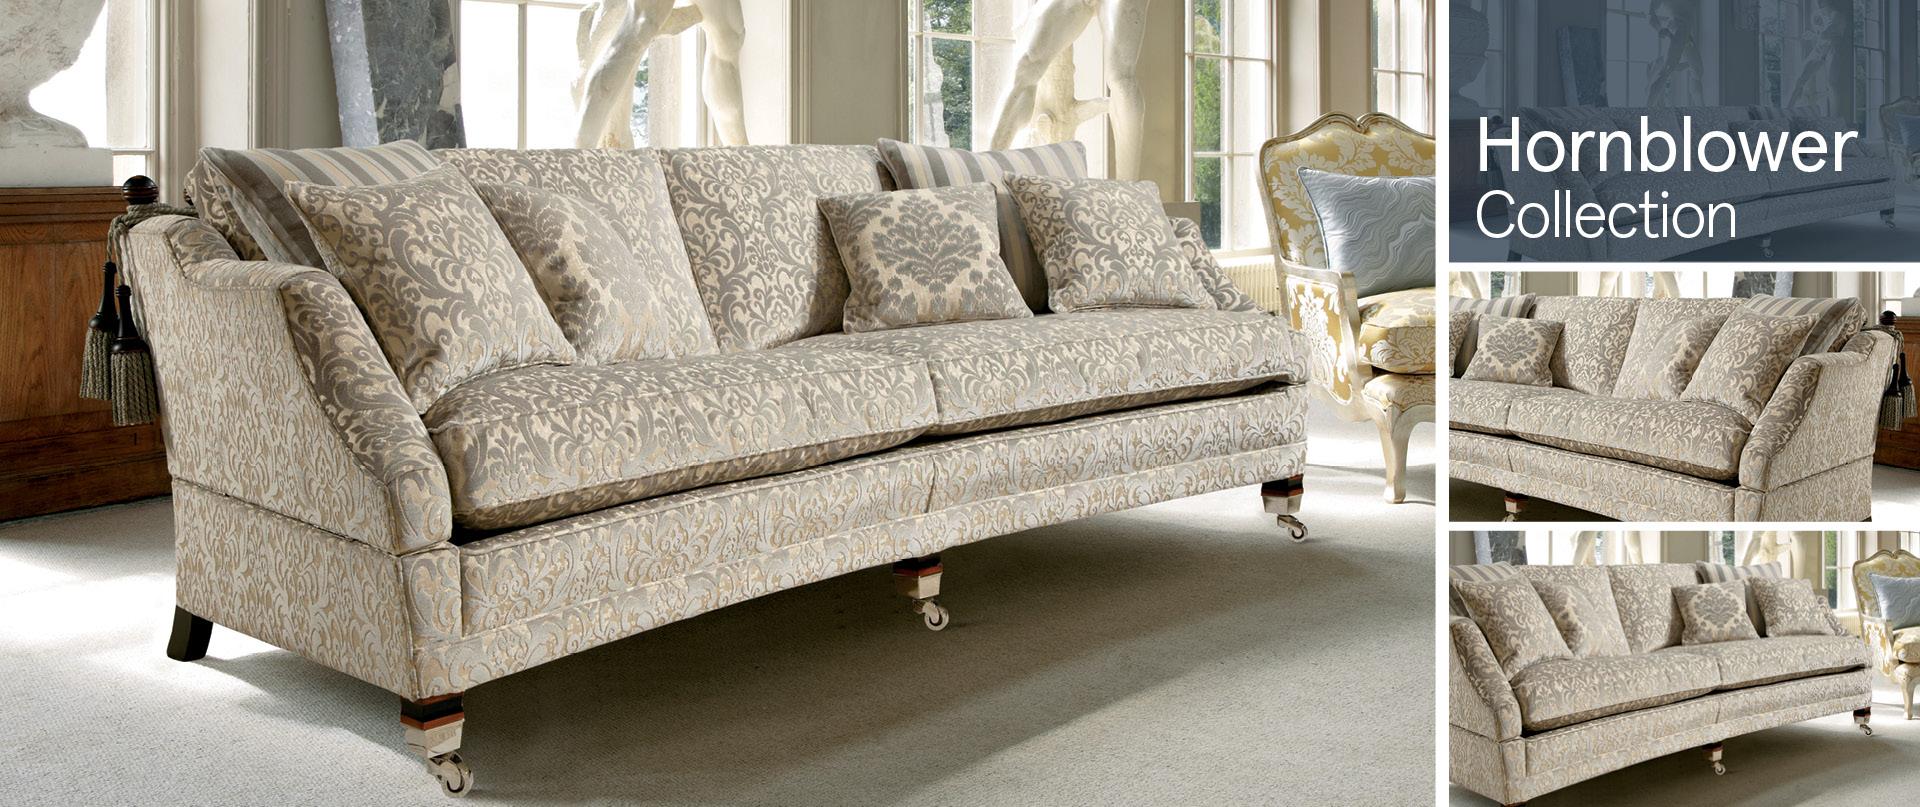 Hornblower Fabric Sofa Ranges